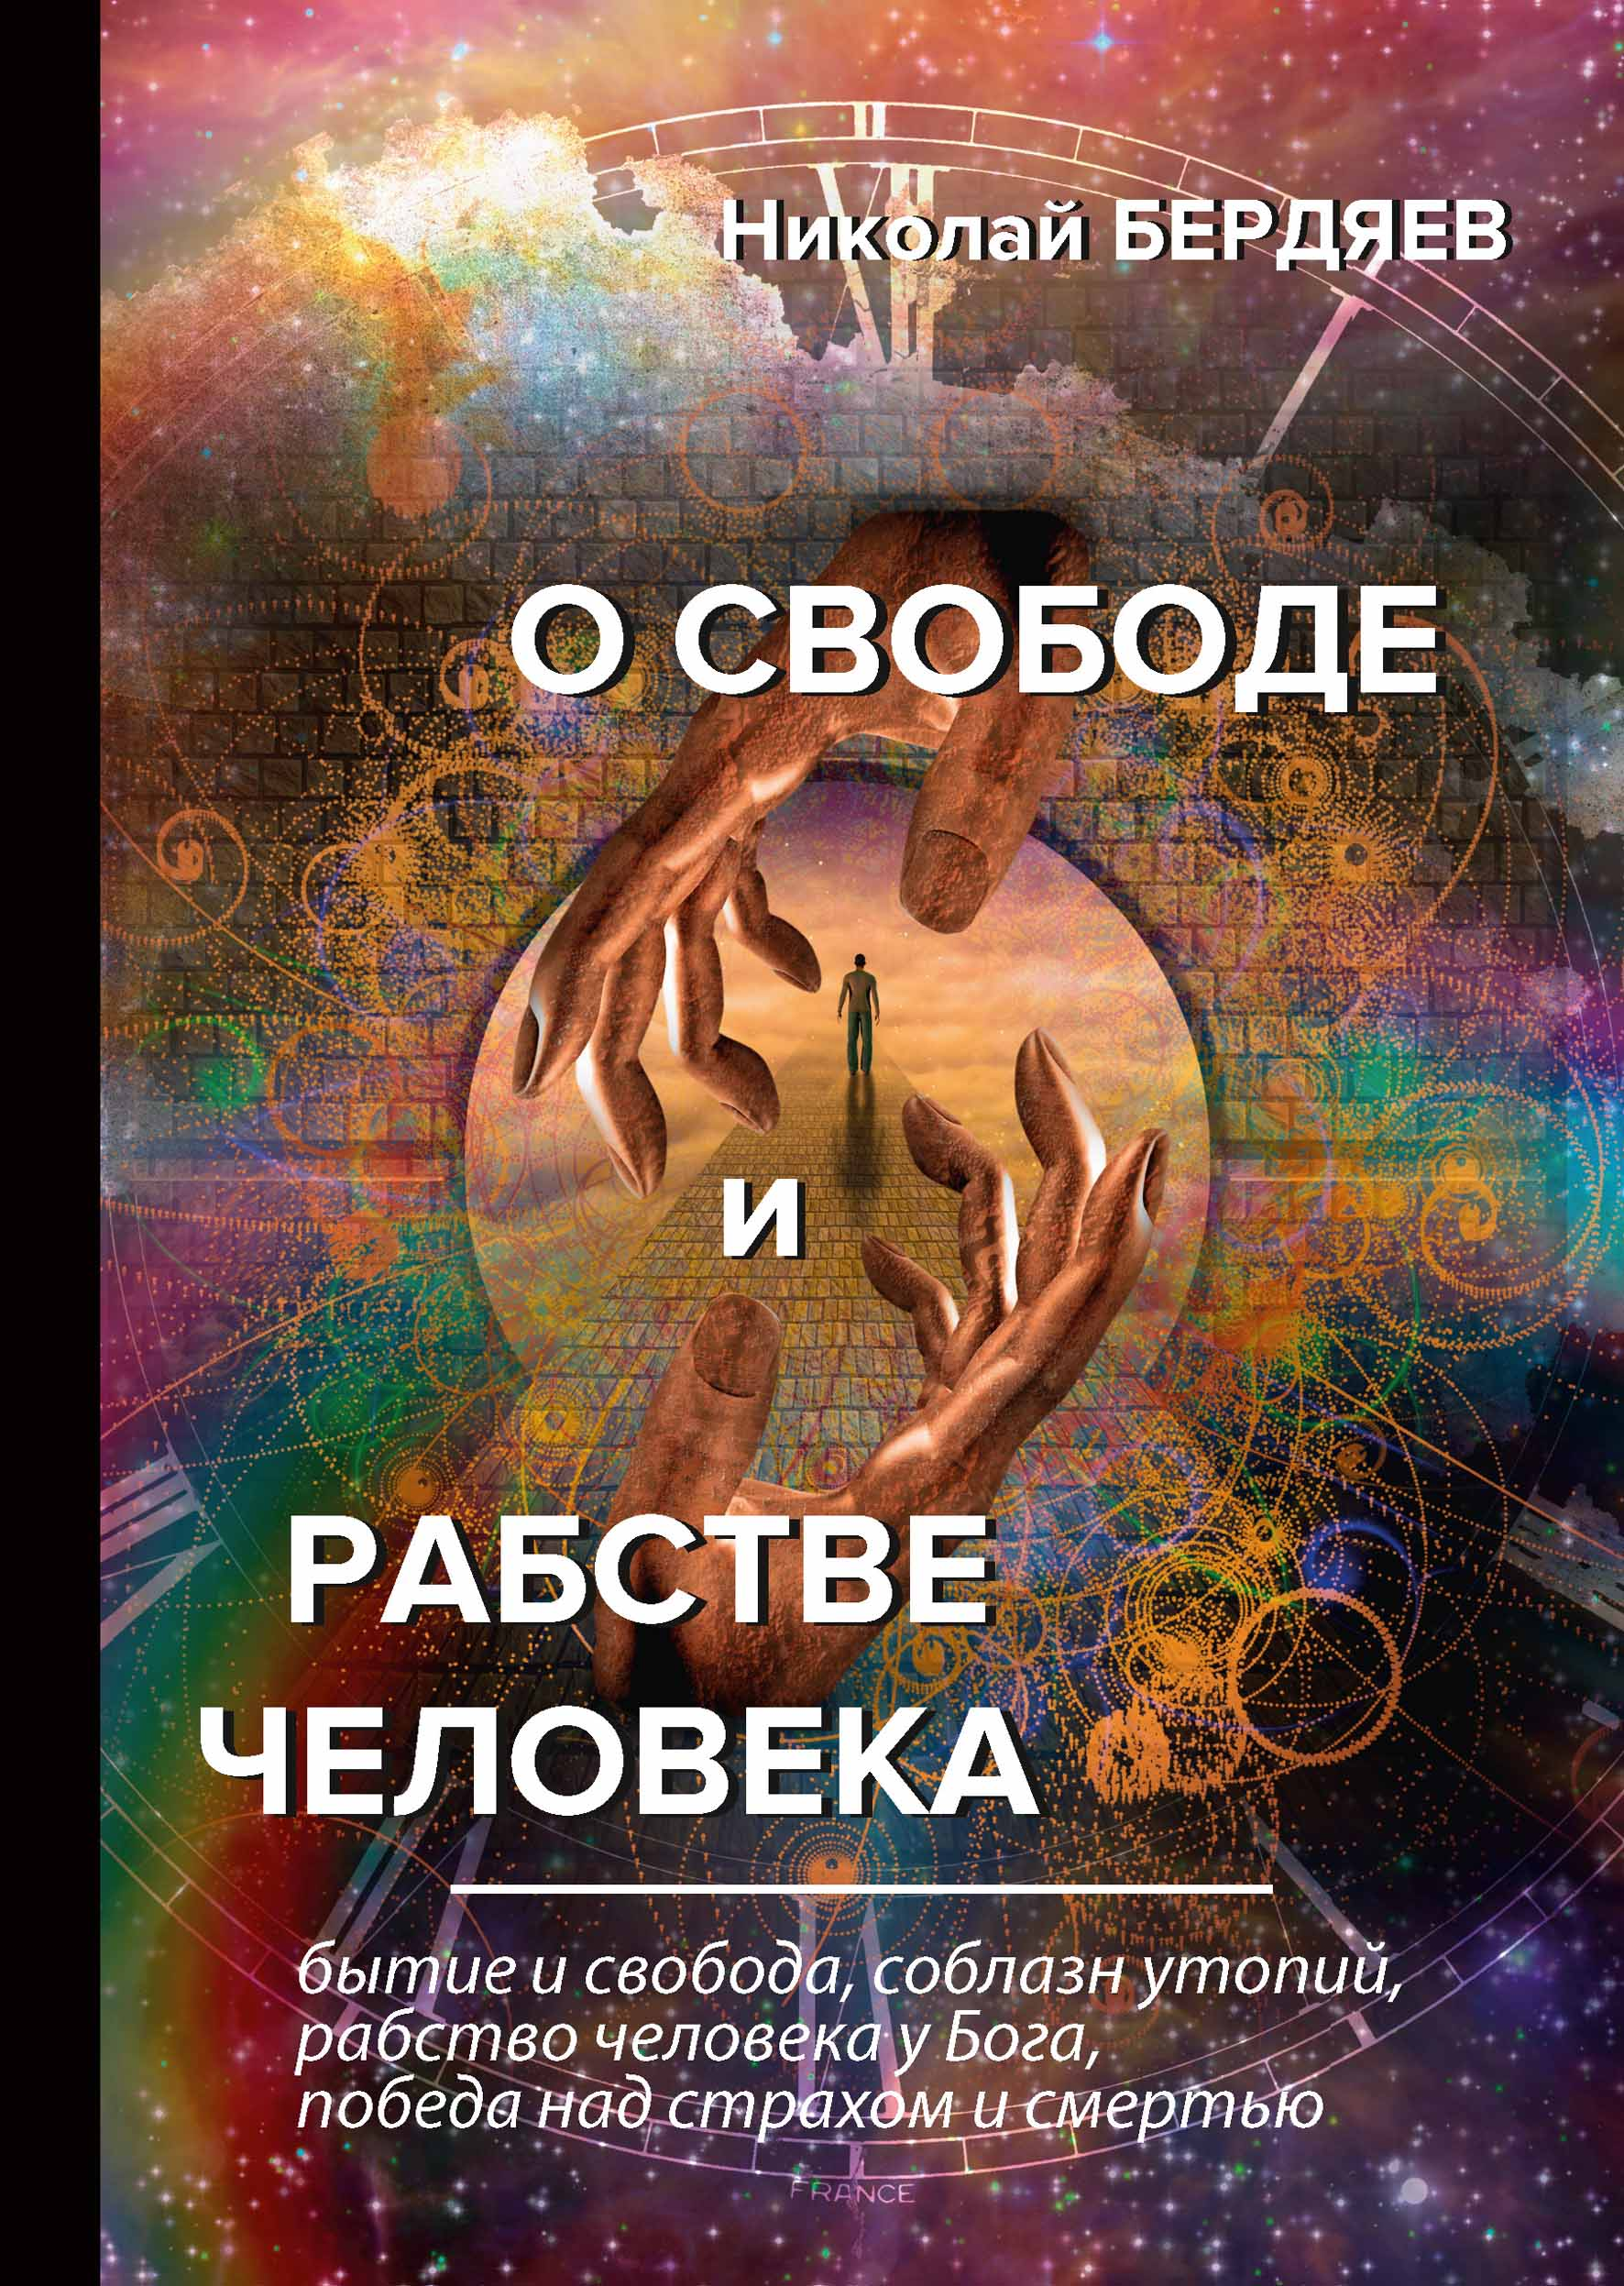 Николай Бердяев О свободе и рабстве человека бердяев н о свободе и рабстве человека